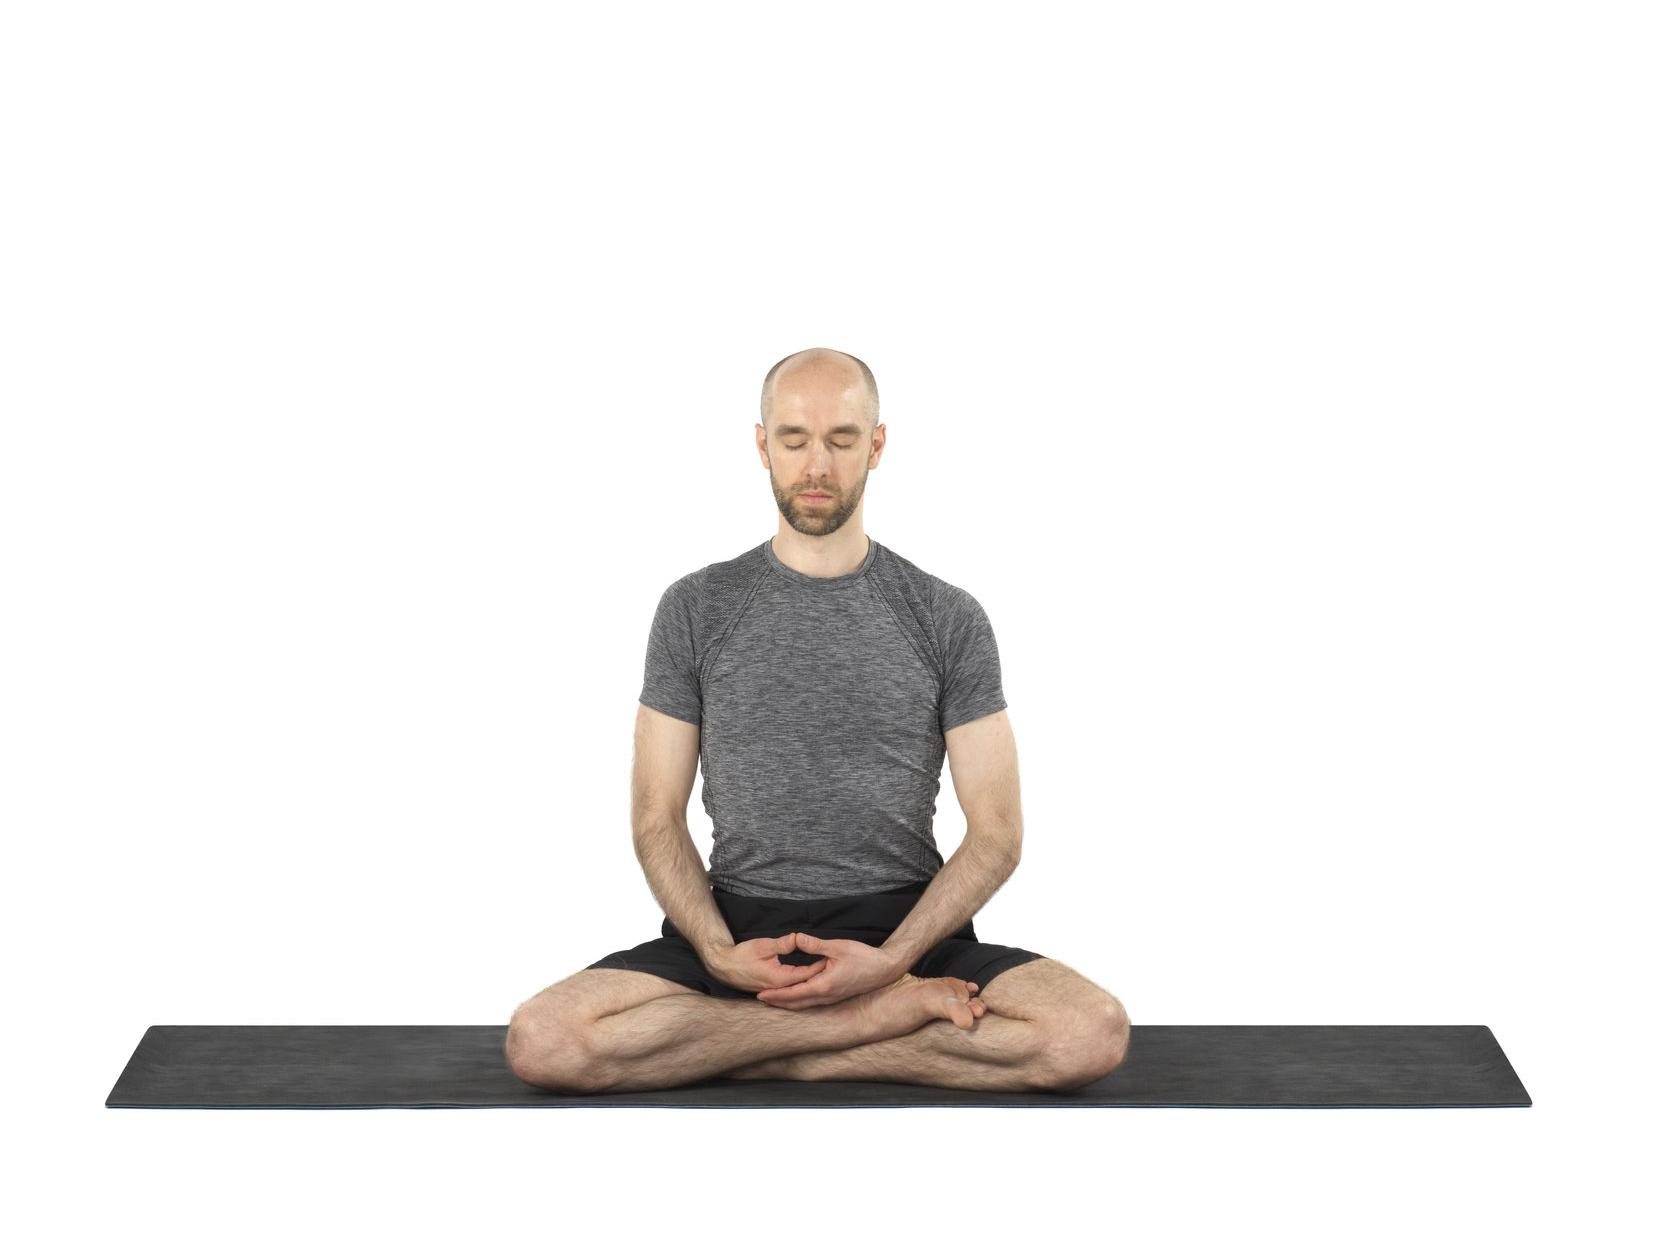 Seated meditation pose